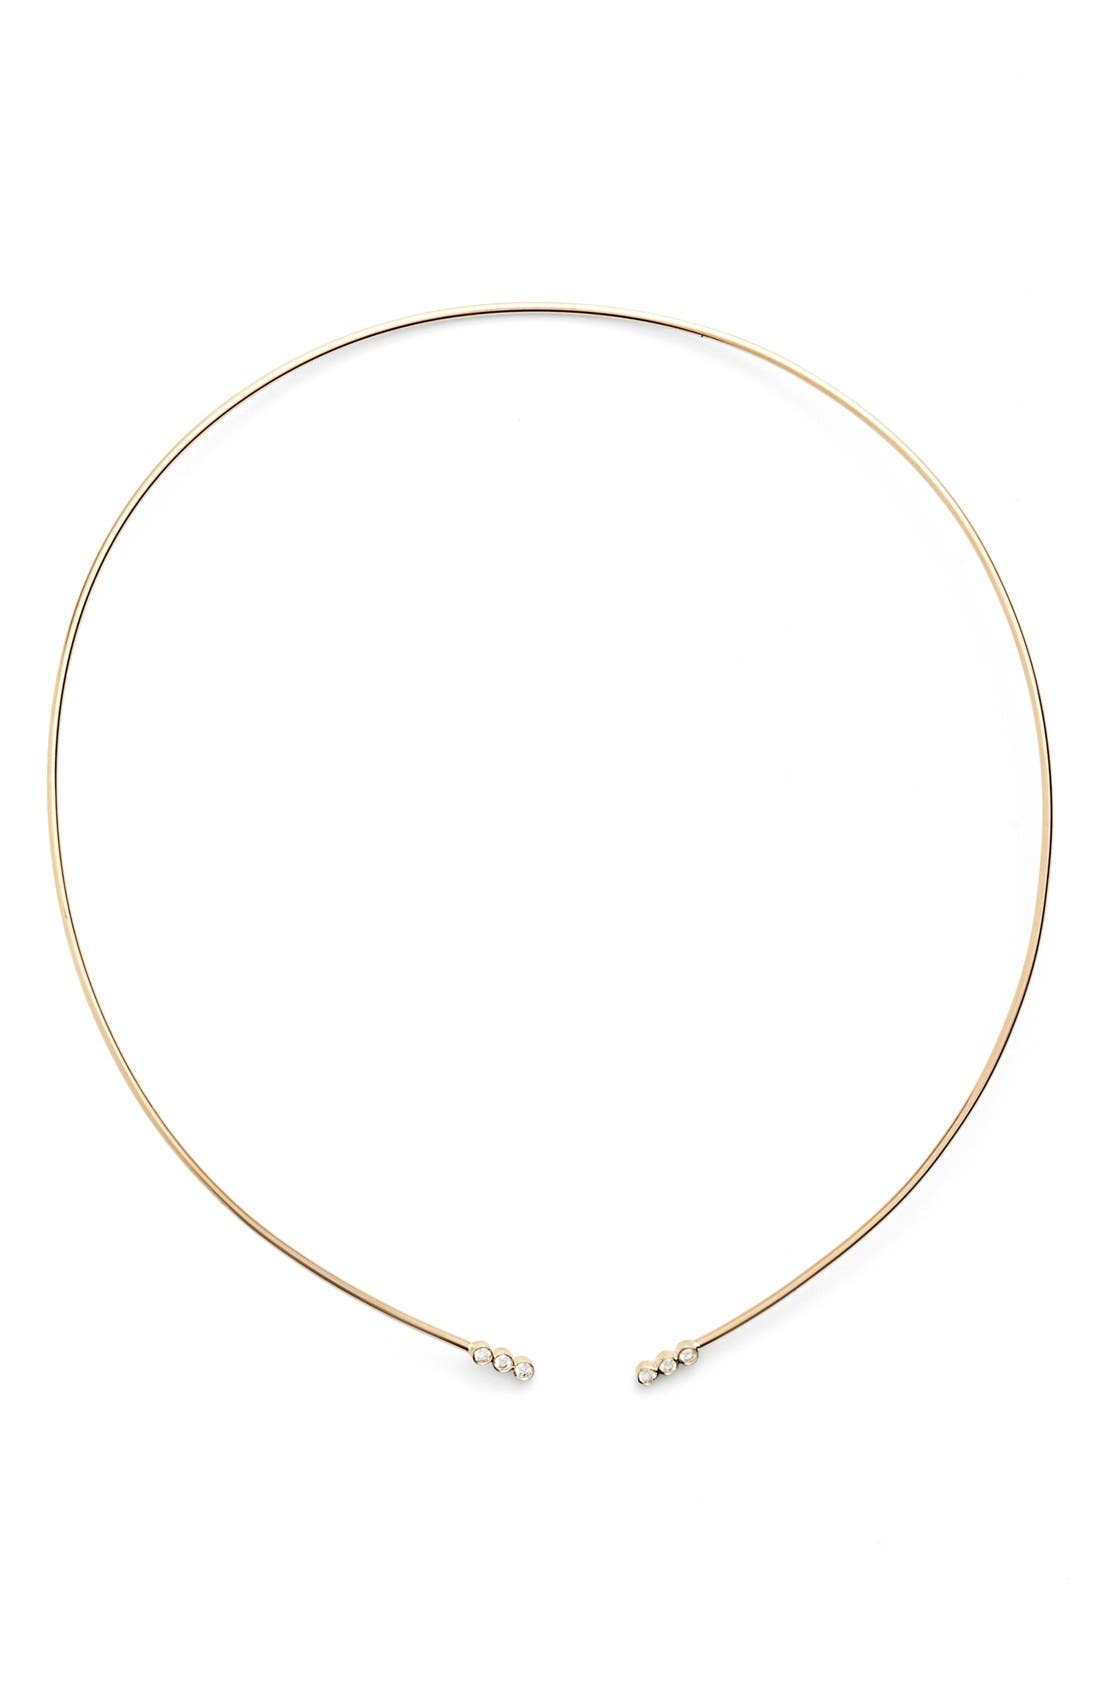 Main Image - Zoë Chicco Diamond Collar Necklace